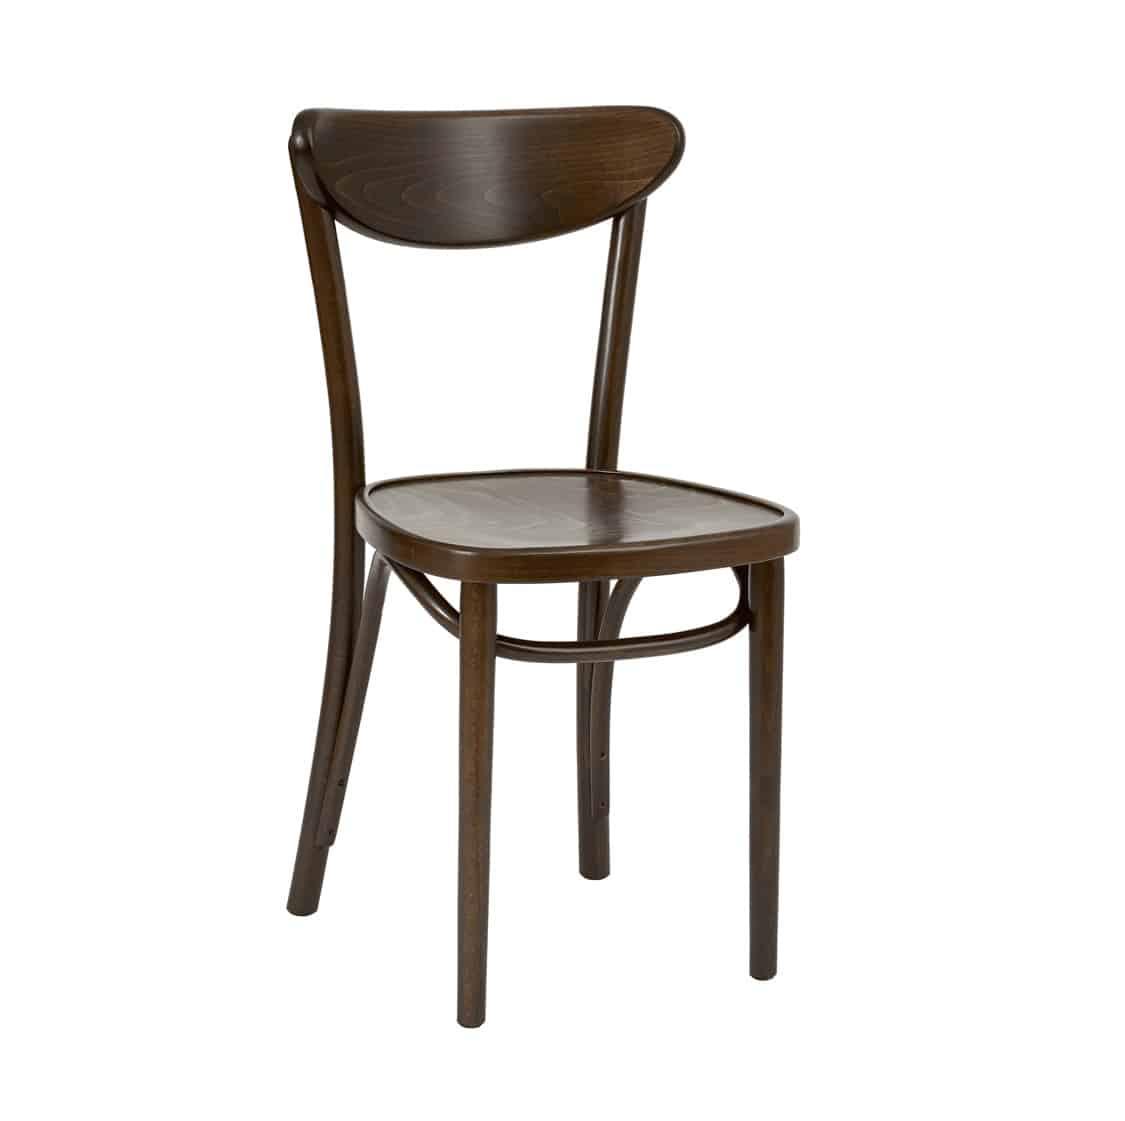 Leo Side Chair Bentwood Fameg 1260 stool DeFrae Contract Walnut